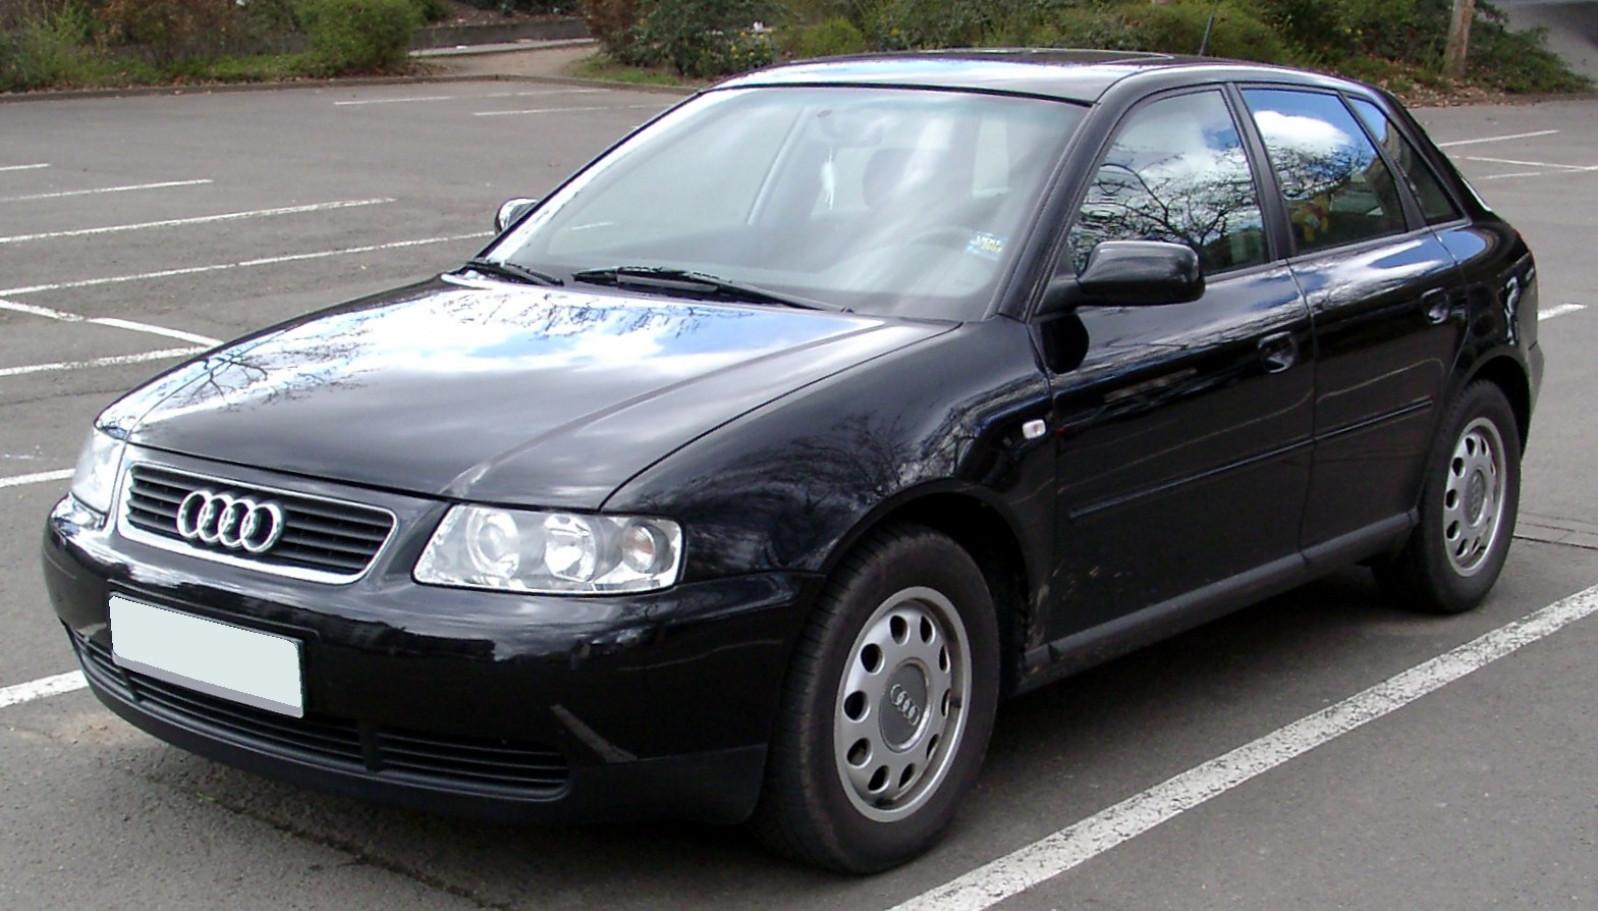 Audi A3 (2e Generation)